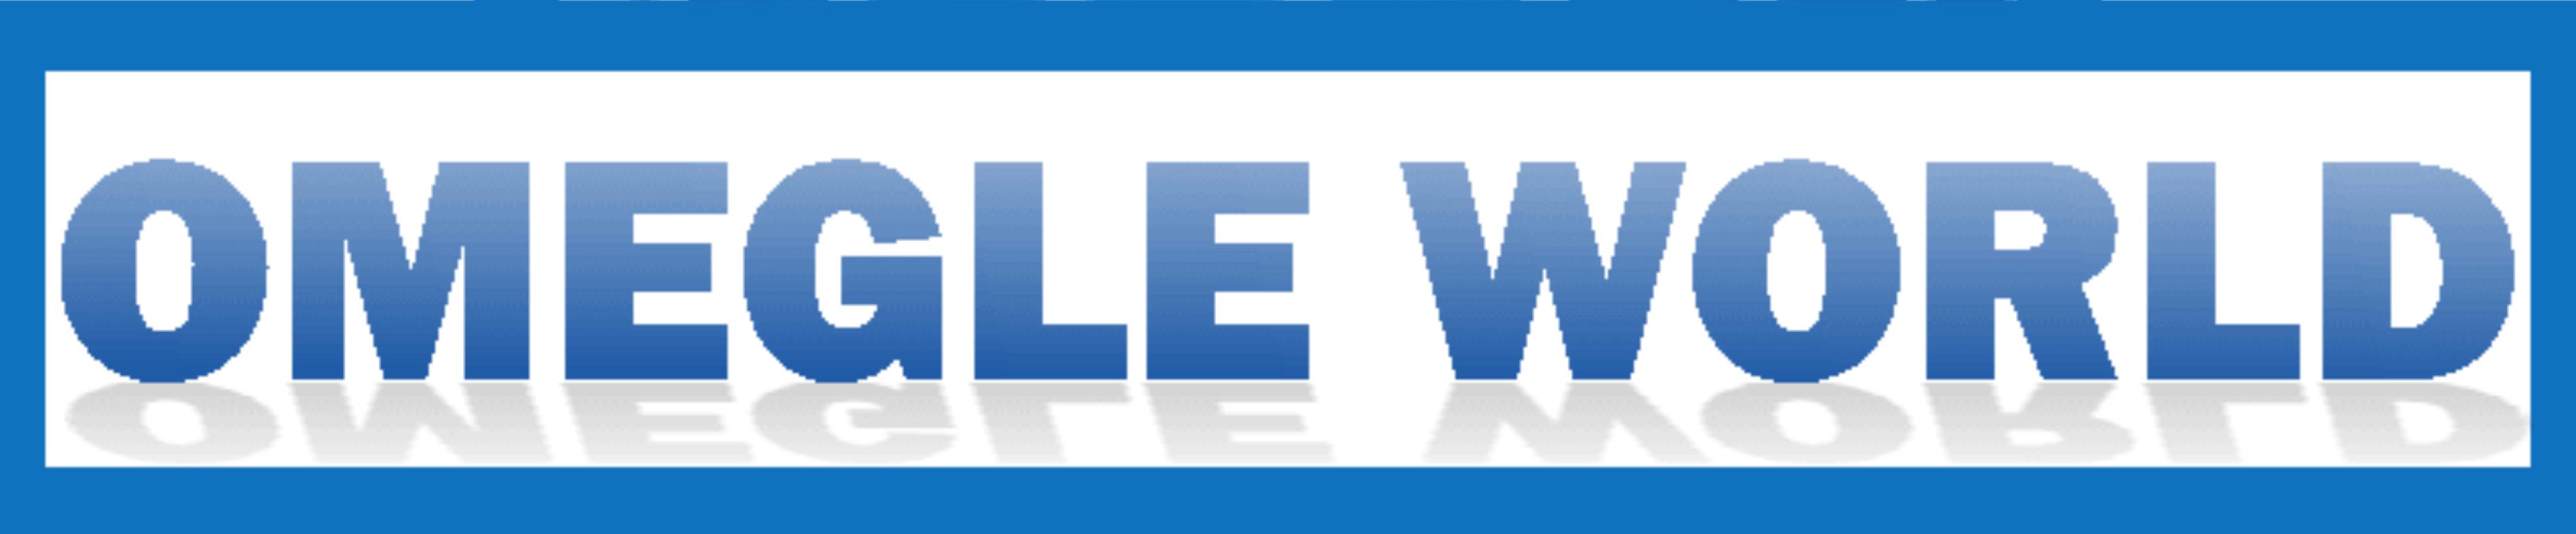 Omegle.world-Talk to Strangers